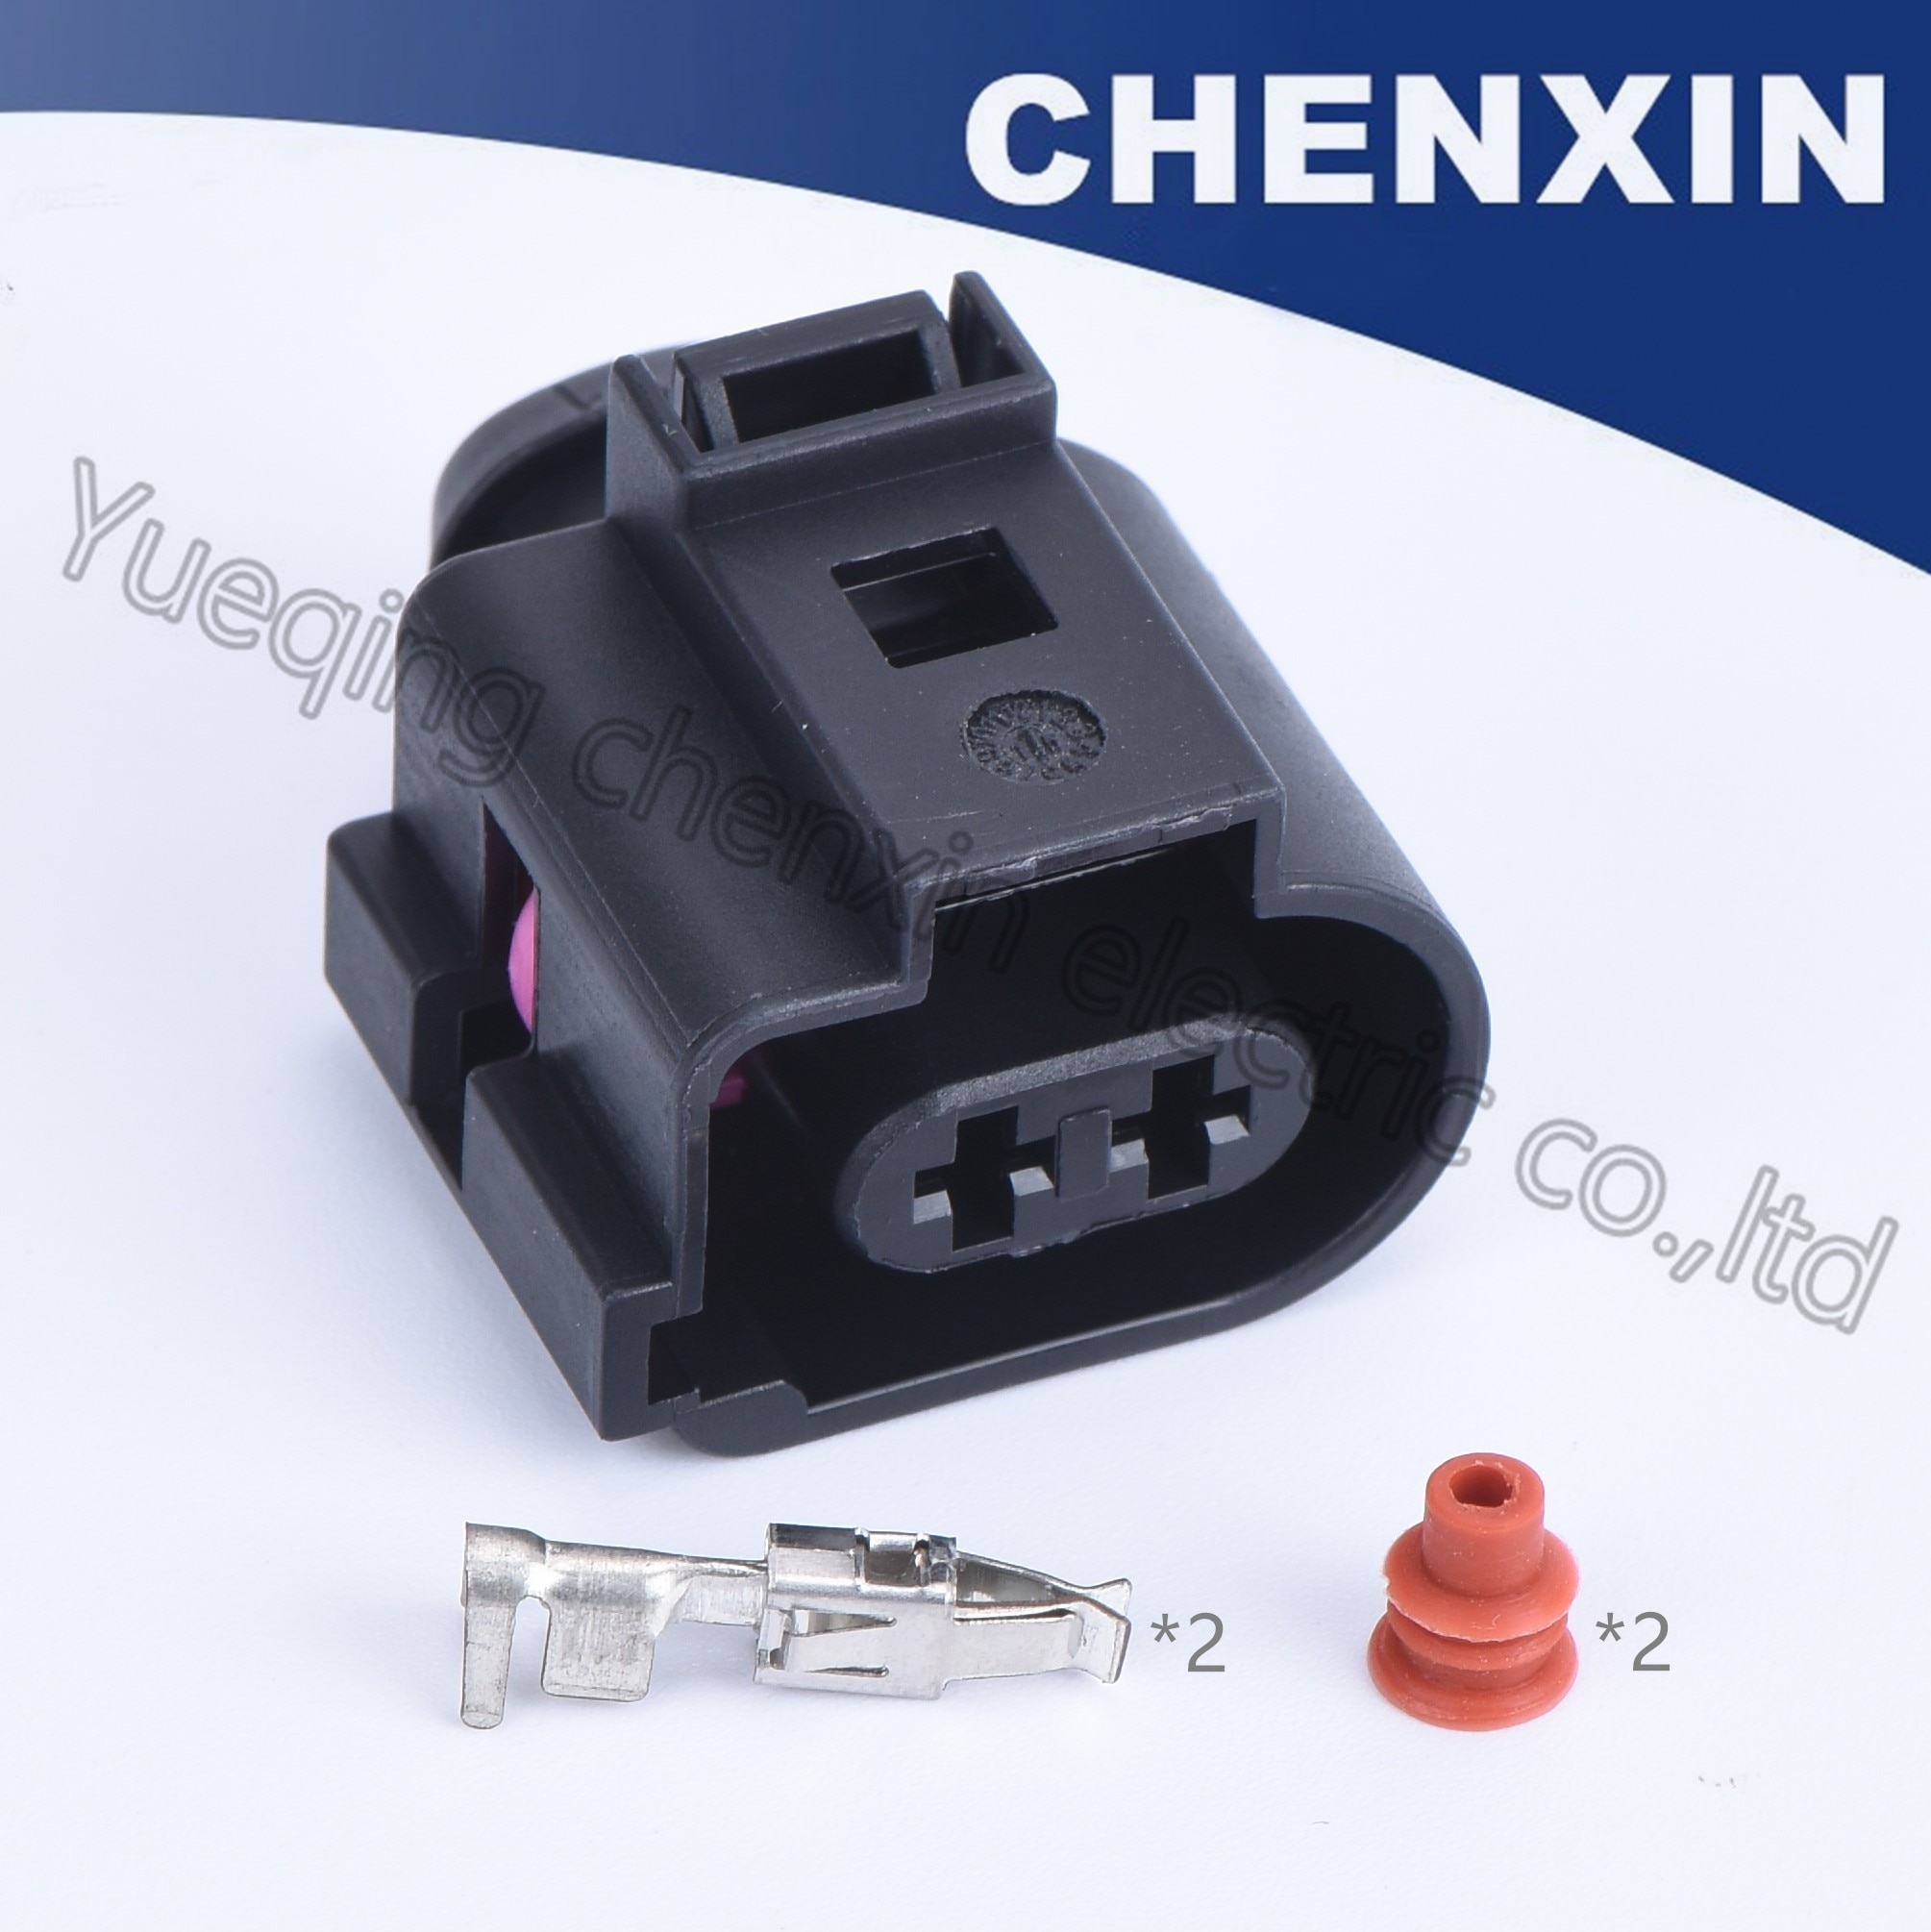 Black 2 pin car waterproof auto connector 3.5 female 1J0973722A B6 A4 A5 Q3 handbrake motor wiring harness connector